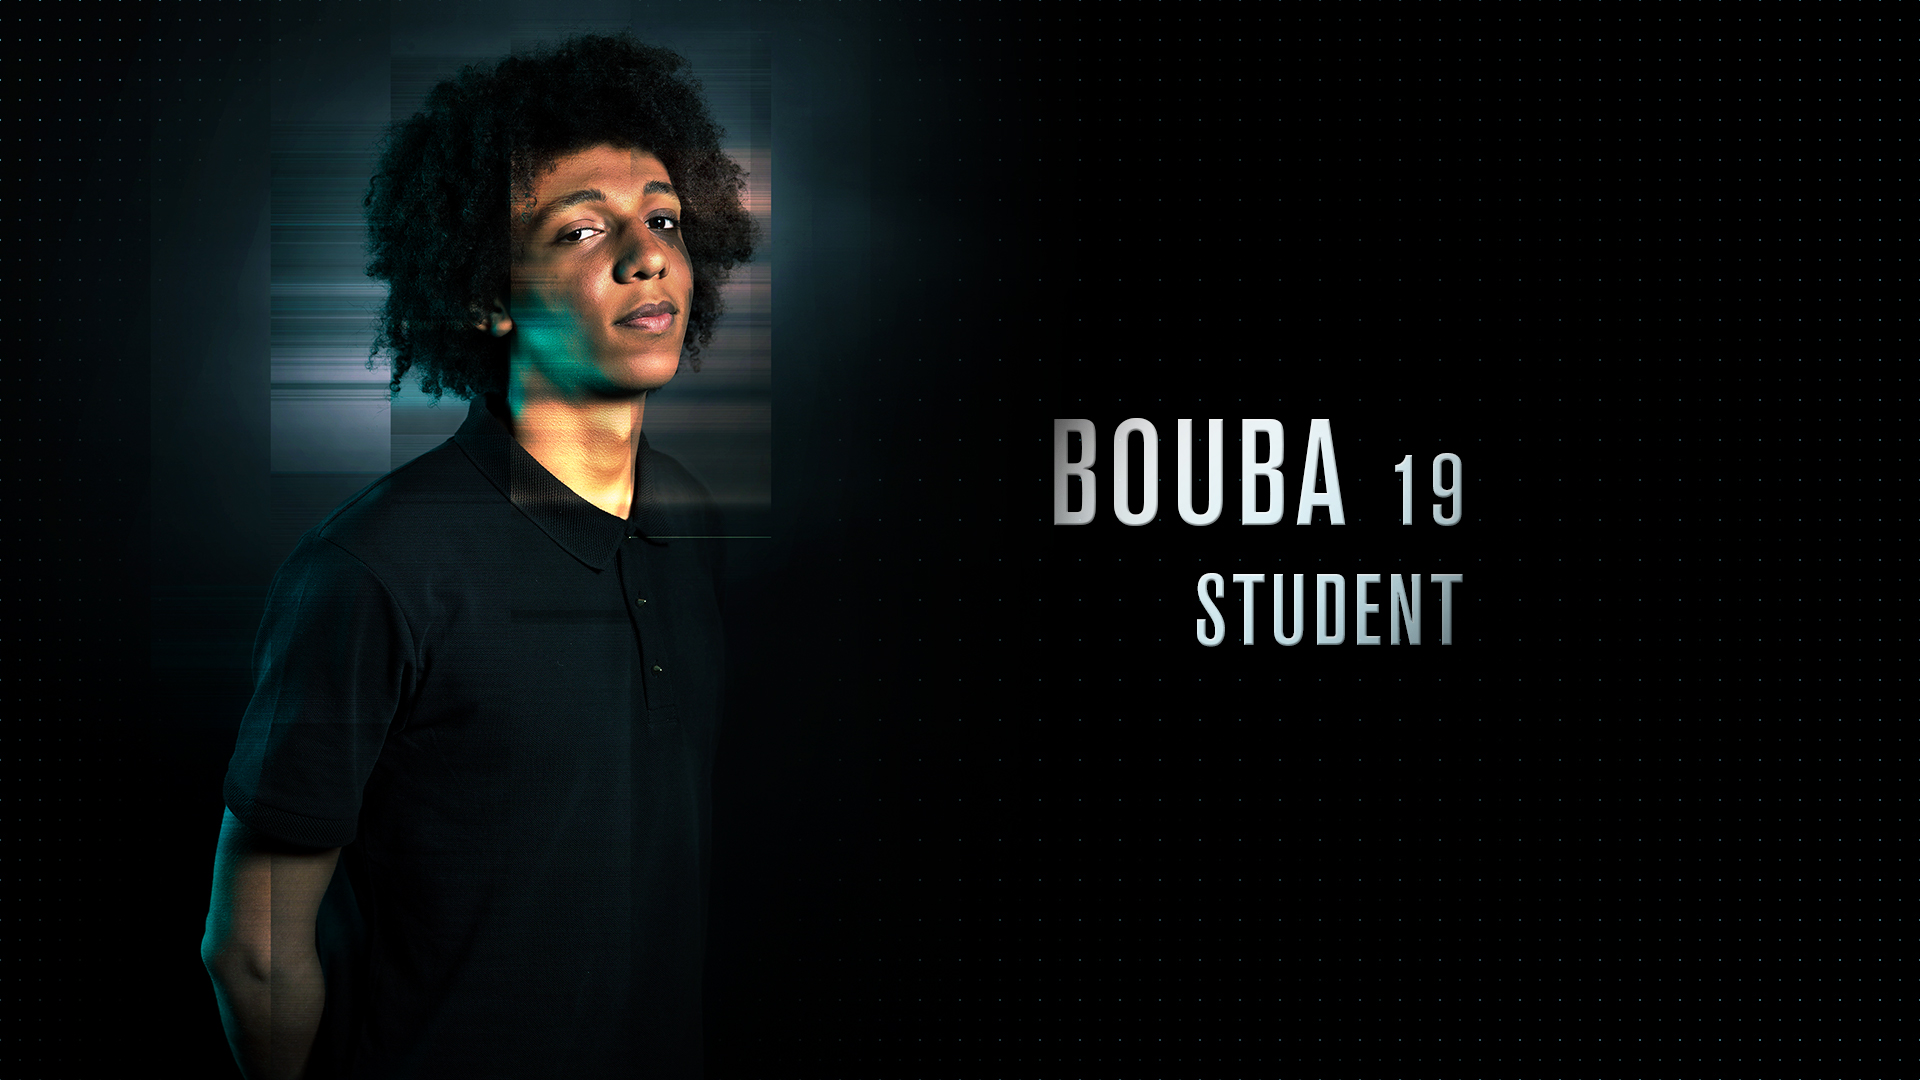 BOUBA-met-tekst